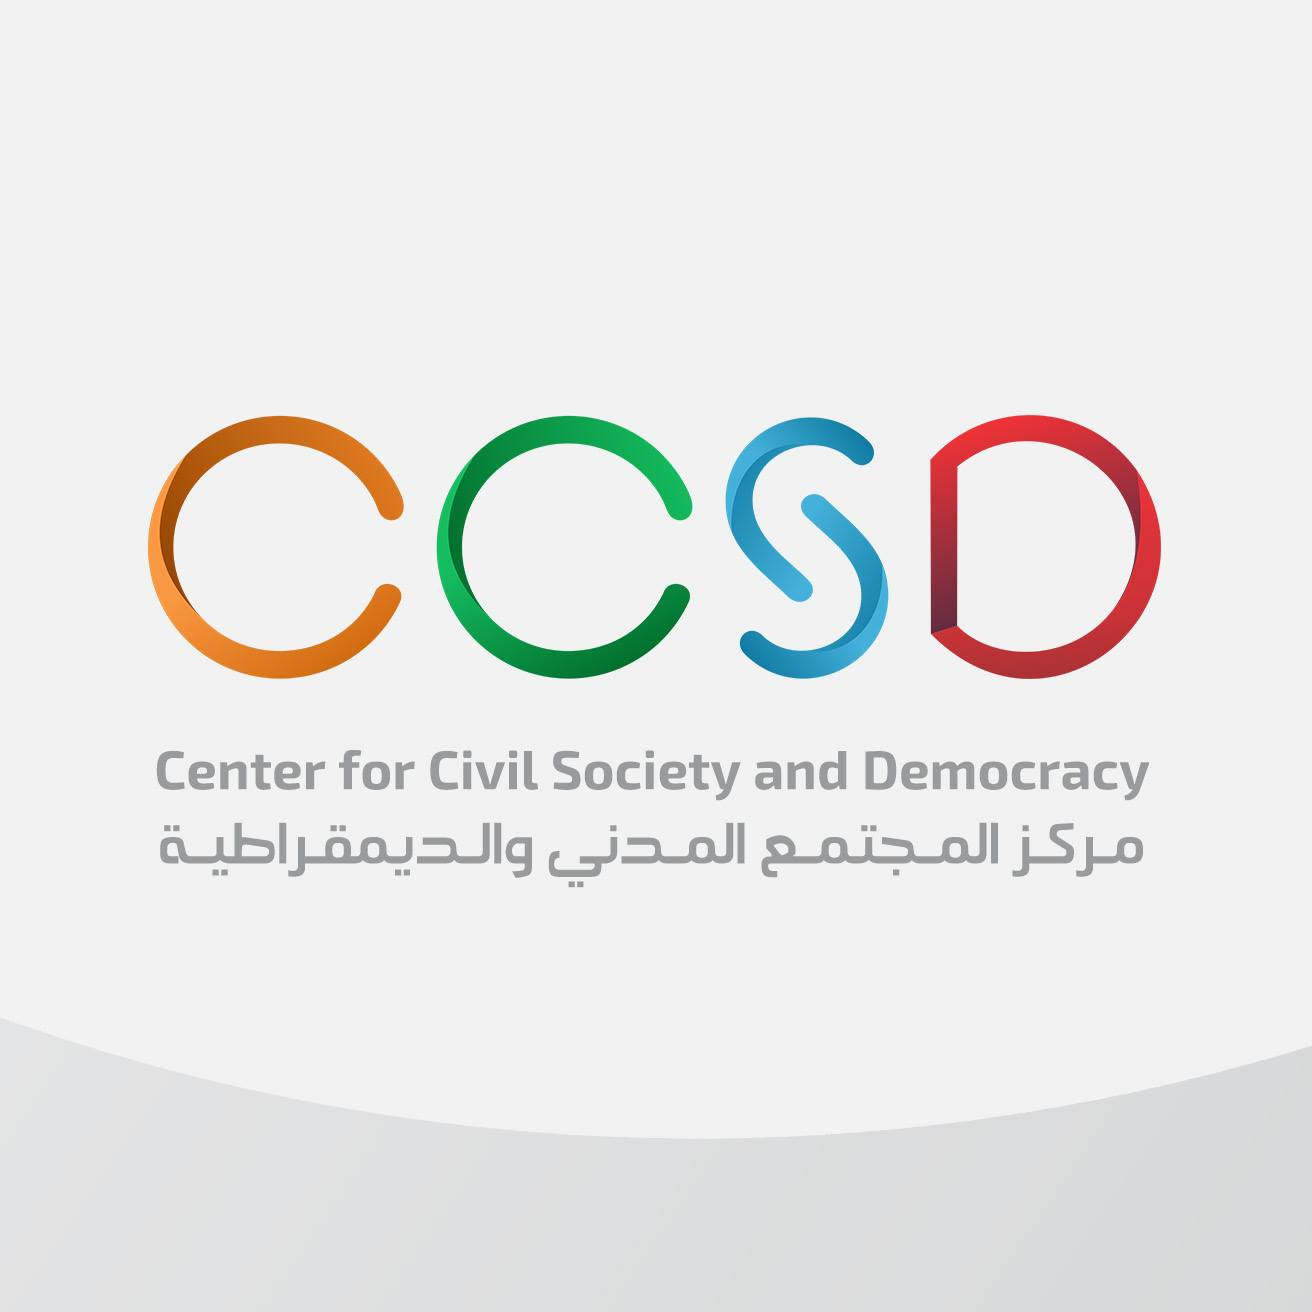 ccsd.jpg